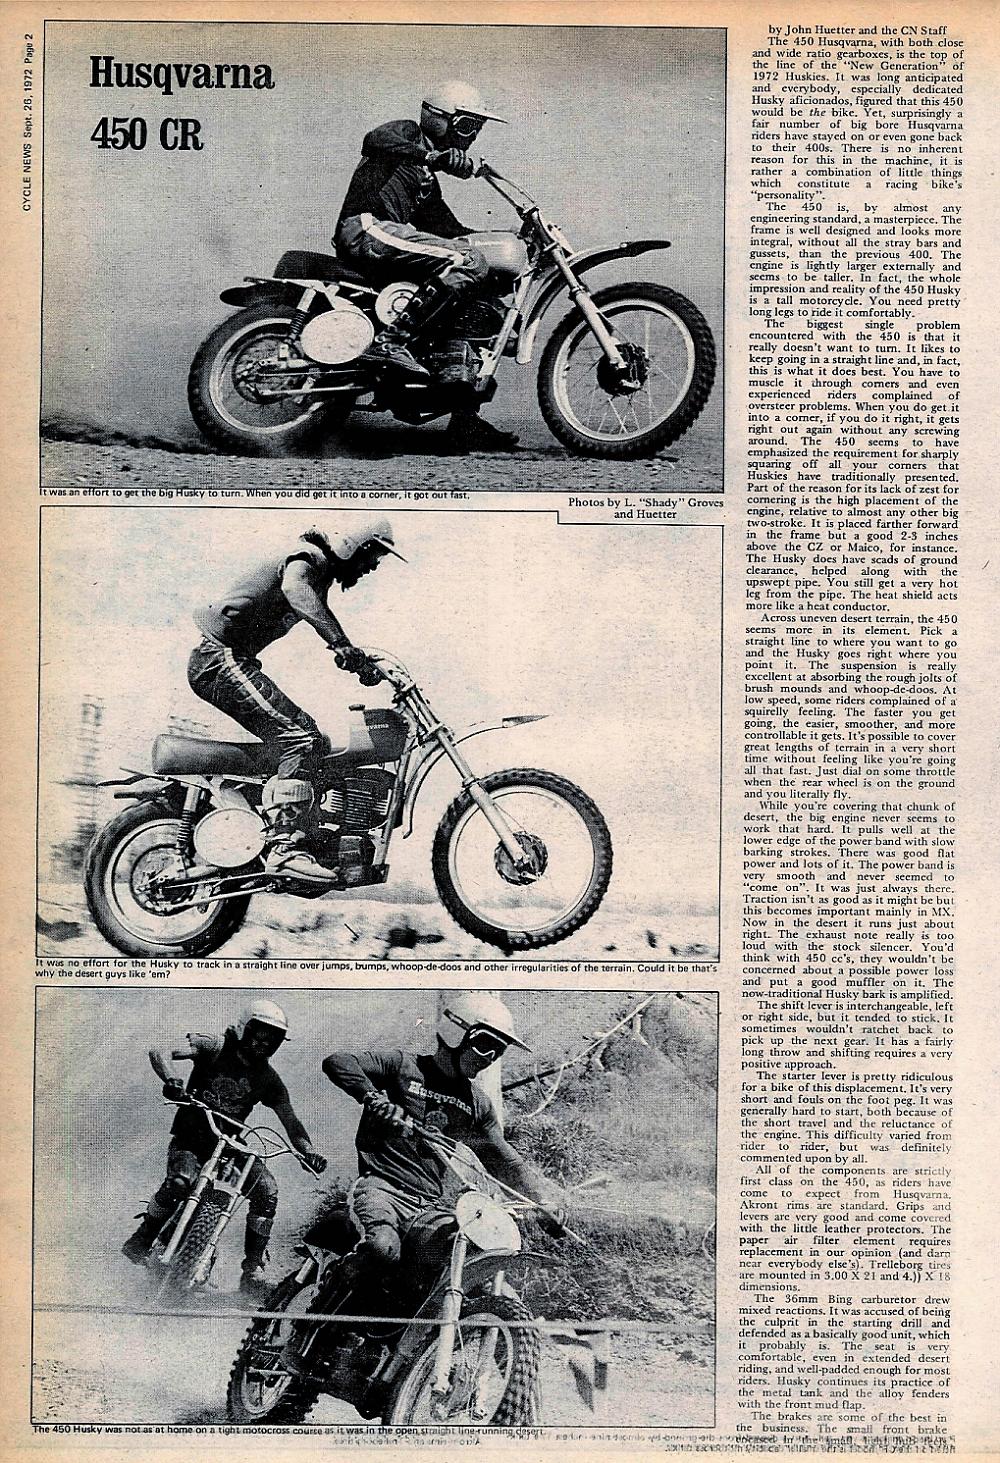 1972 Husqvarna 450 CR road test.1.jpg